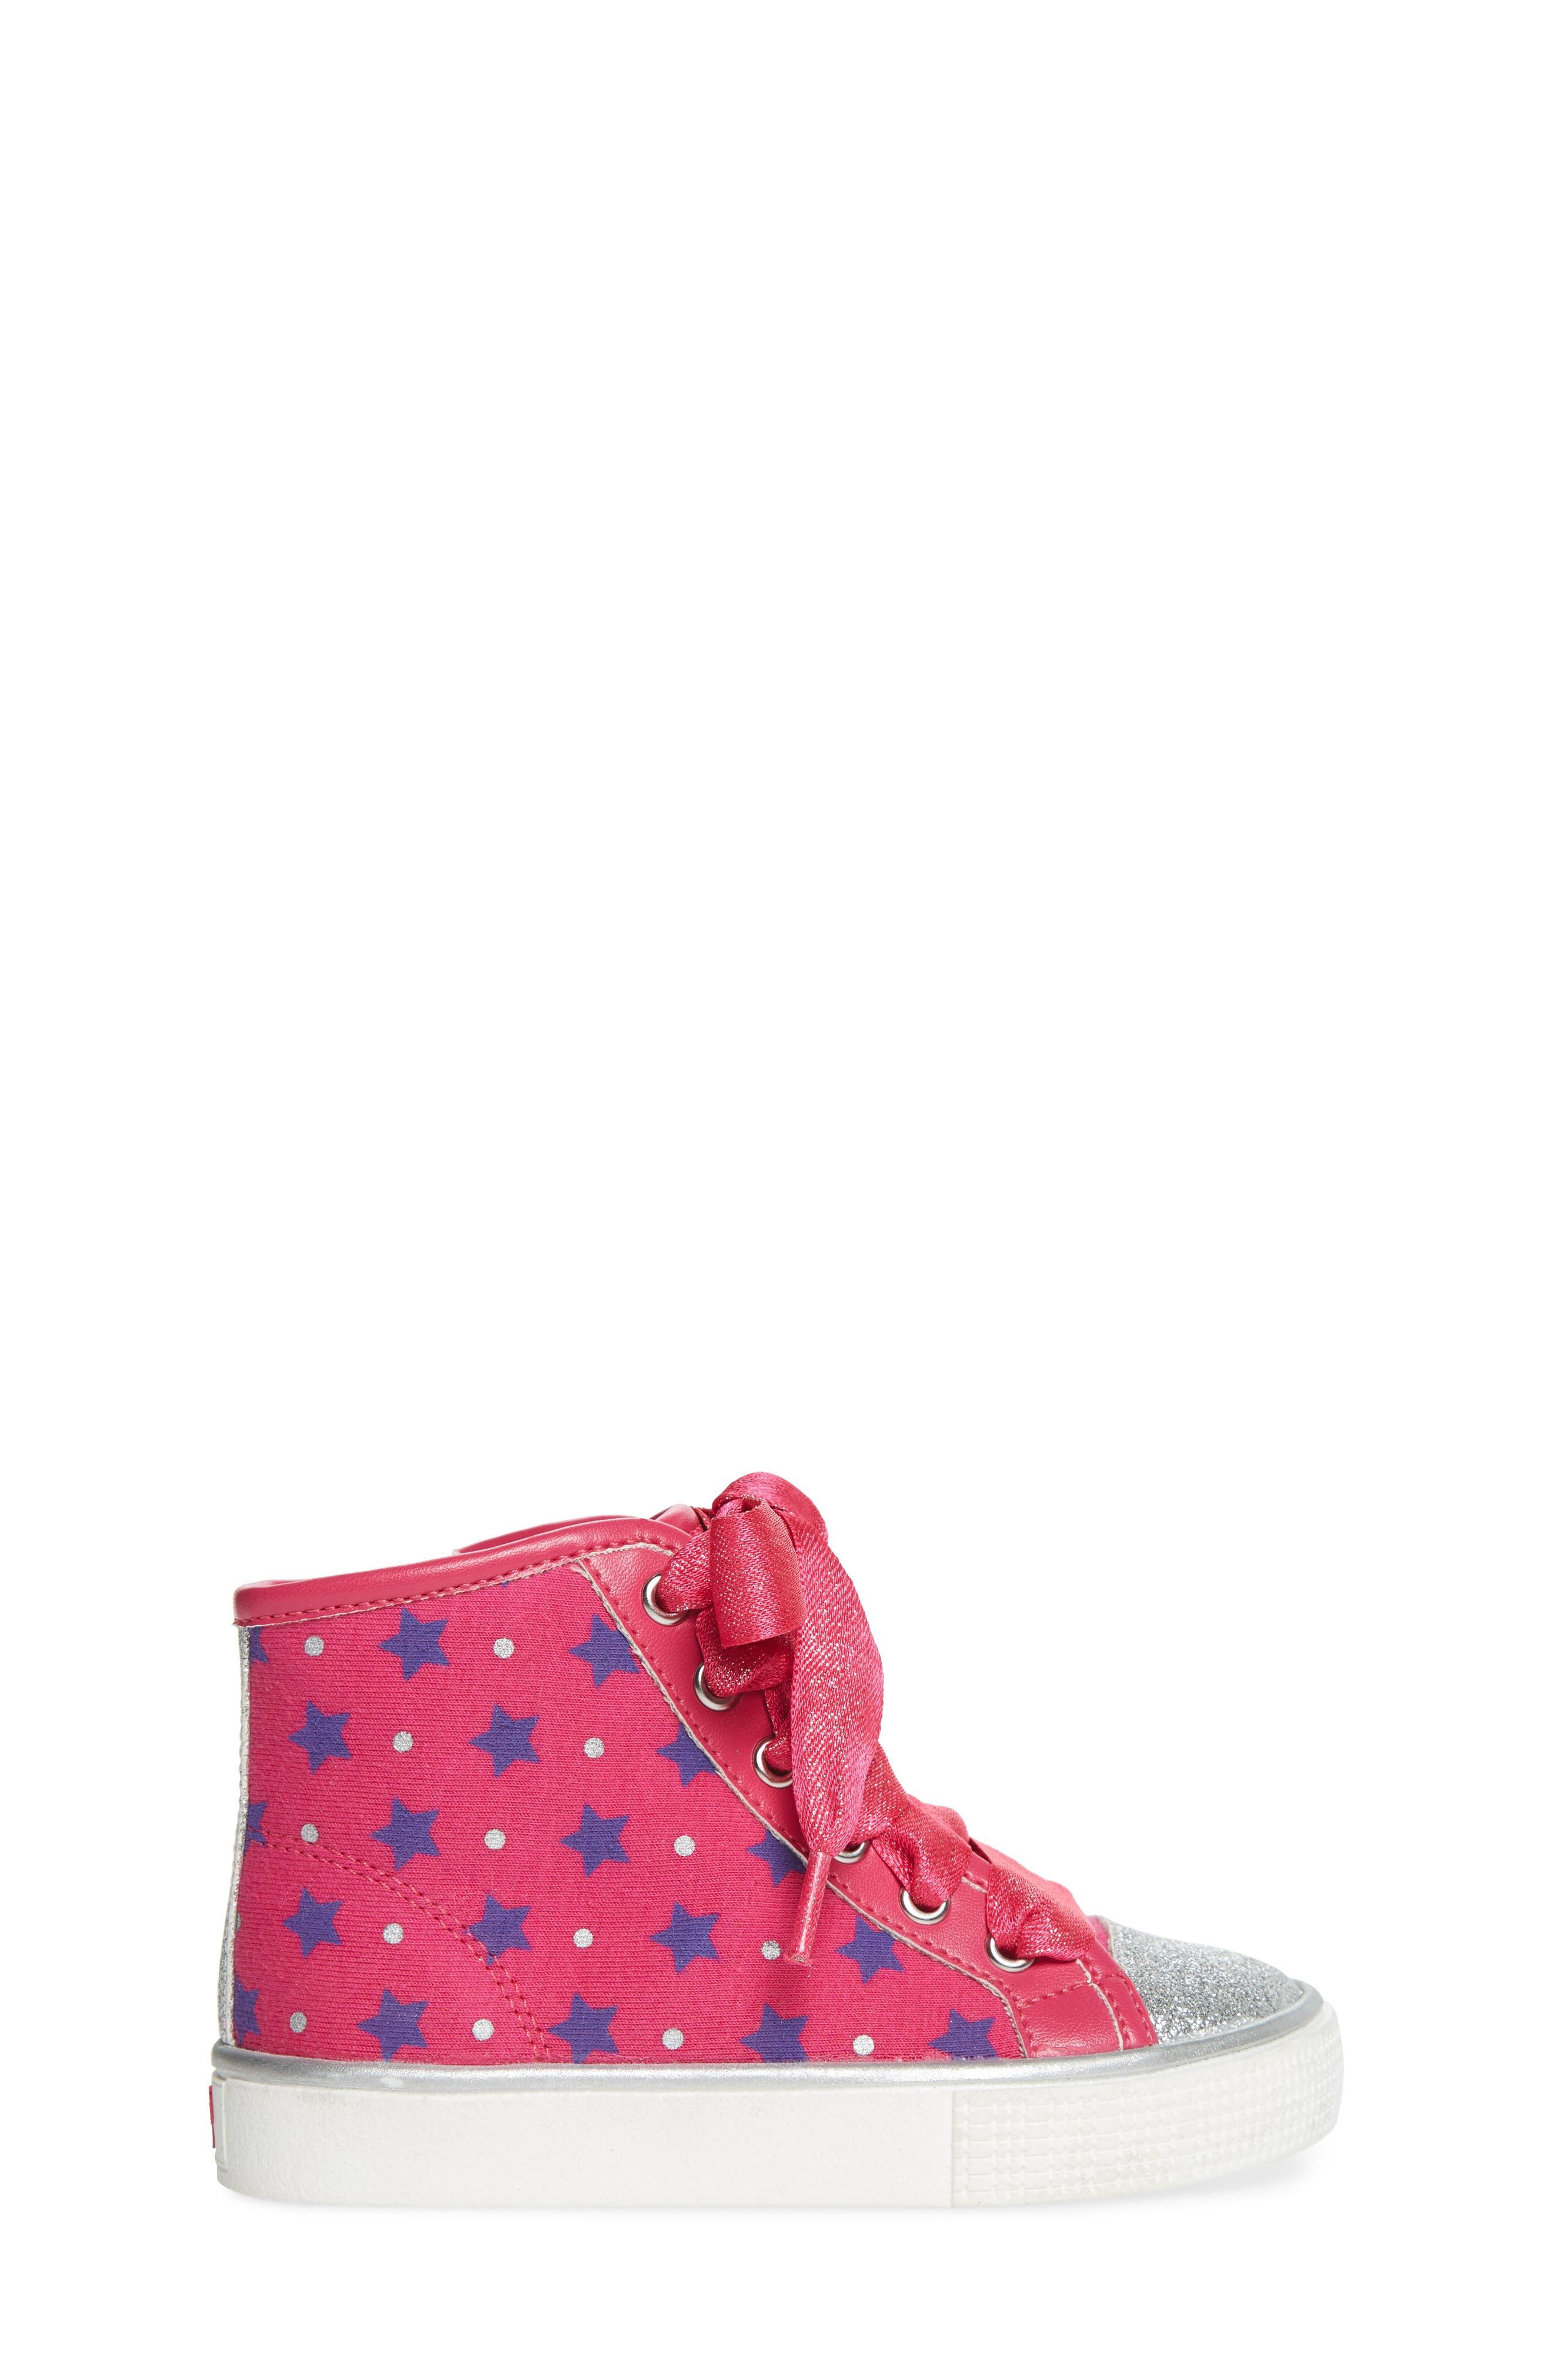 Emerson High Top Sneaker,                             Alternate thumbnail 3, color,                             Pink/ Purple